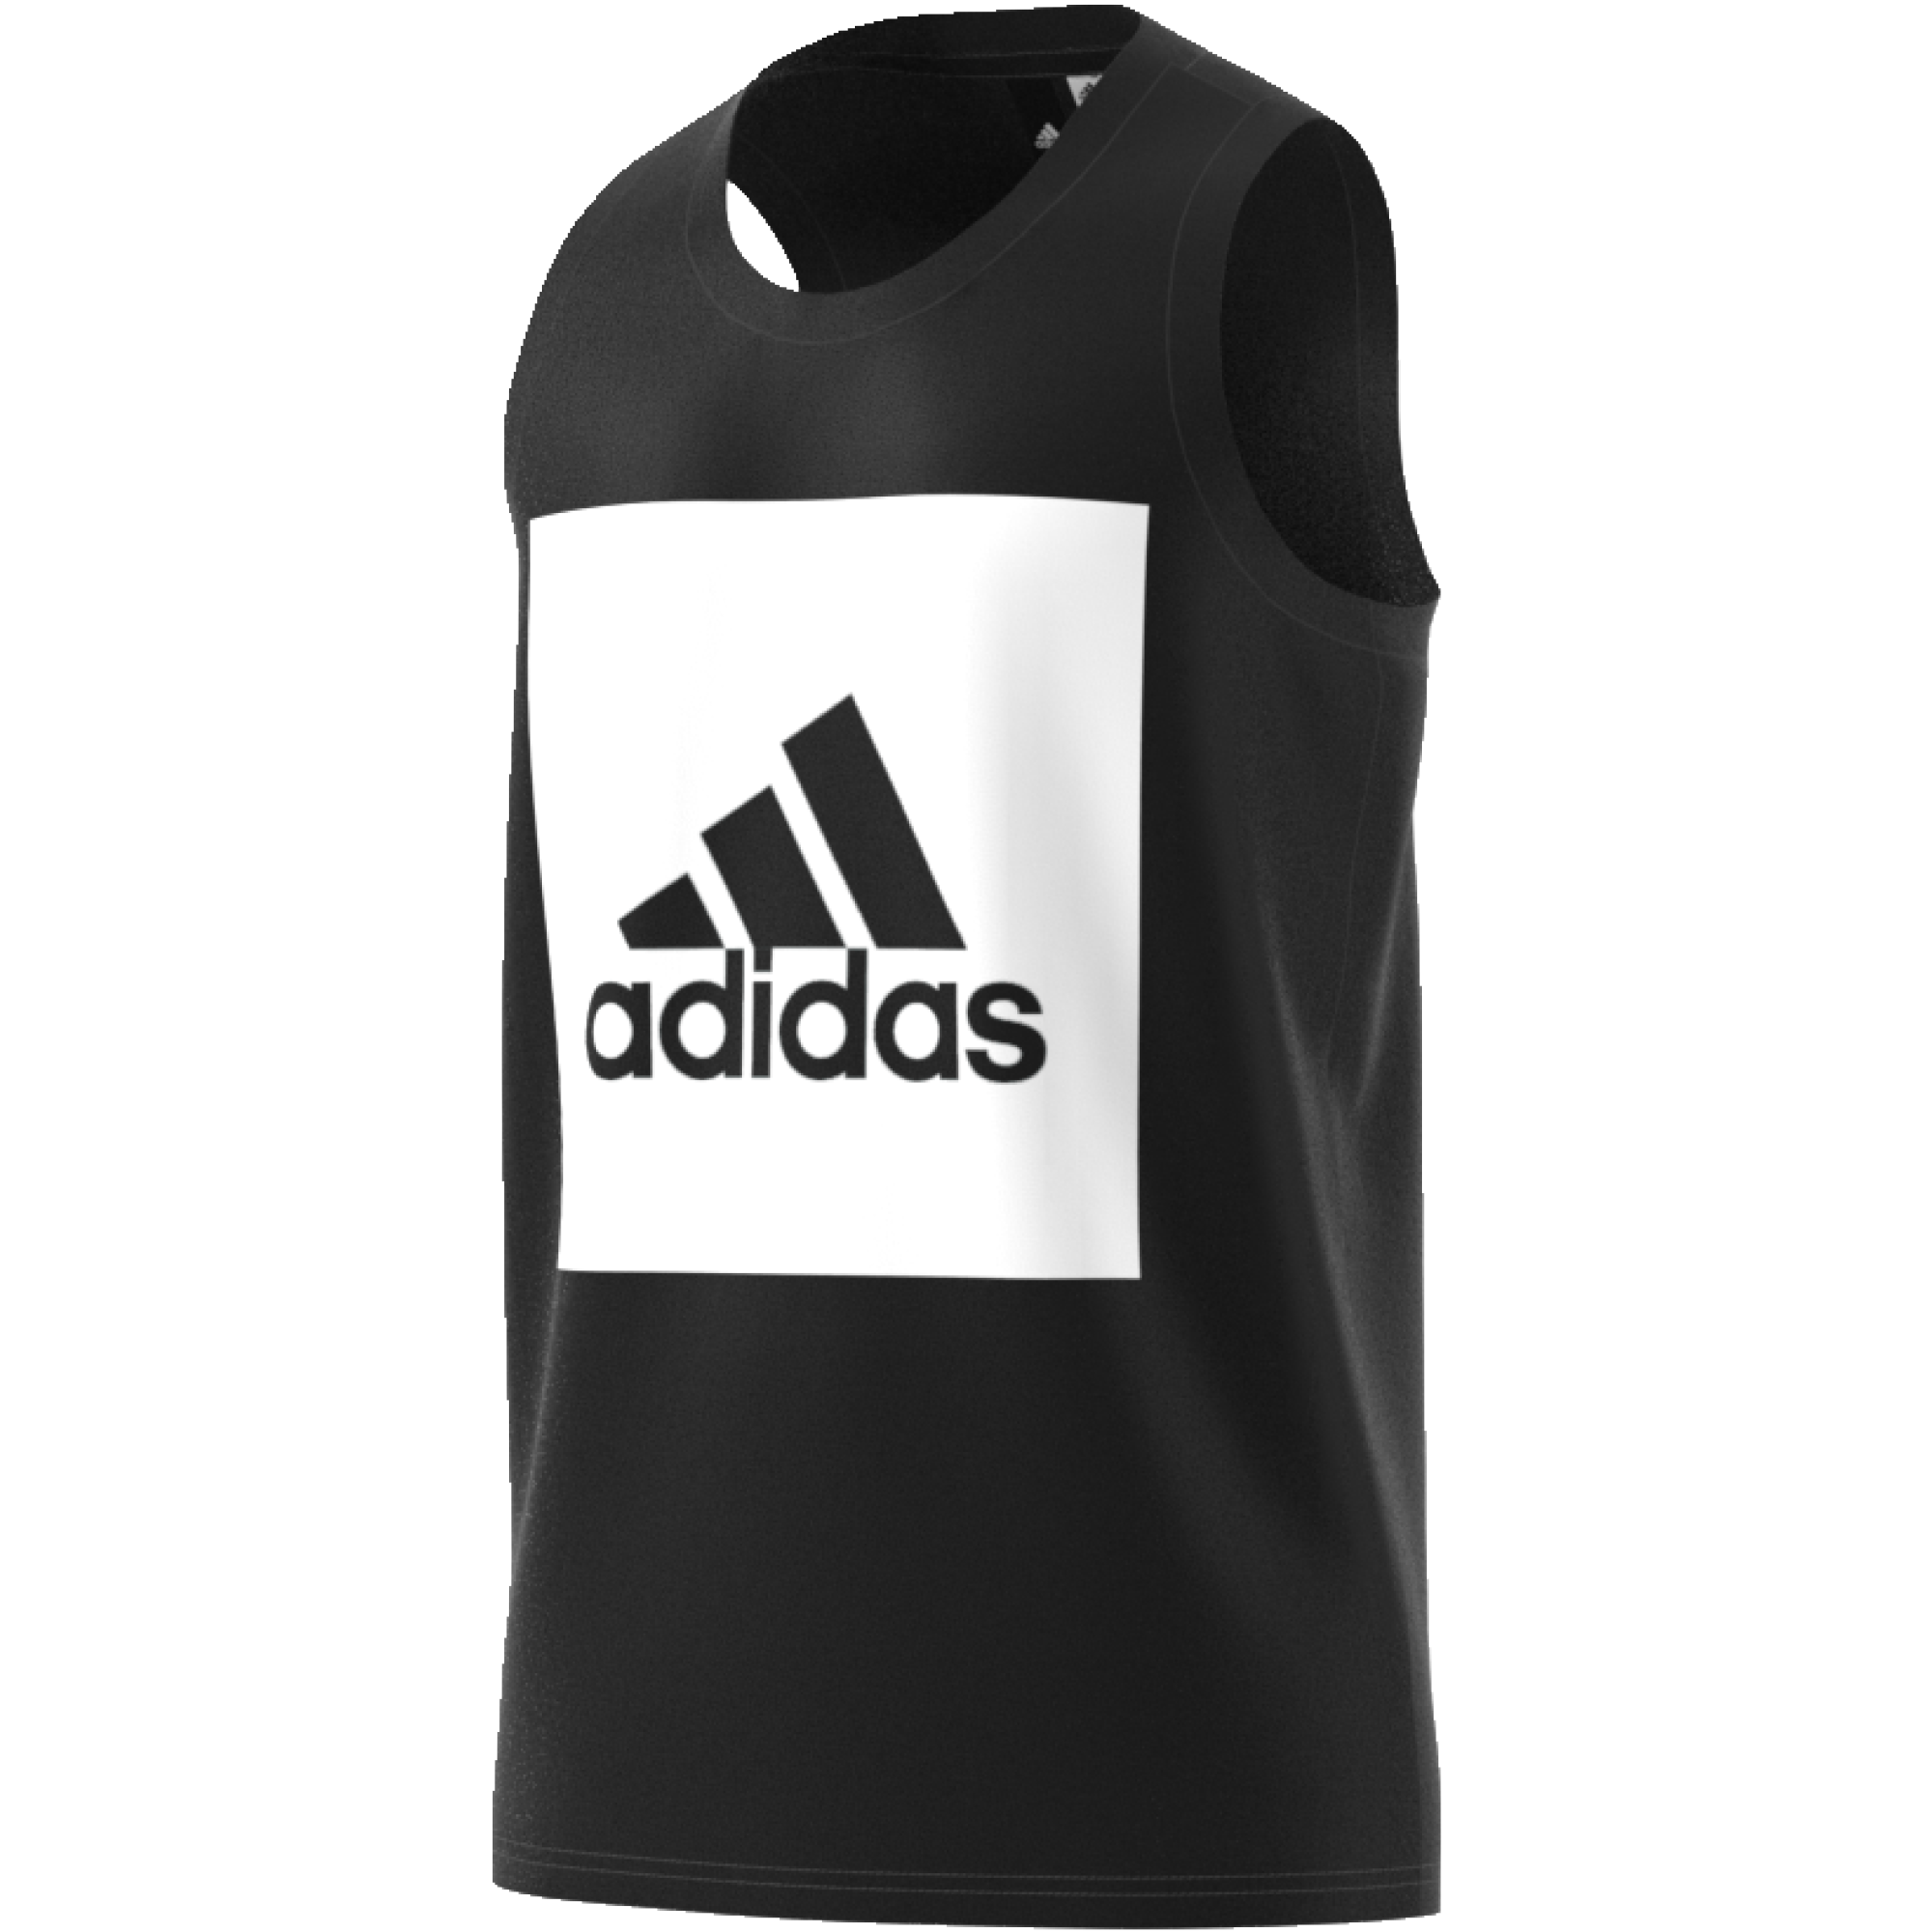 e44e8267f8 Adidas trikó , Férfi ruházat   trikó , adidas_performance , Adidas trikó